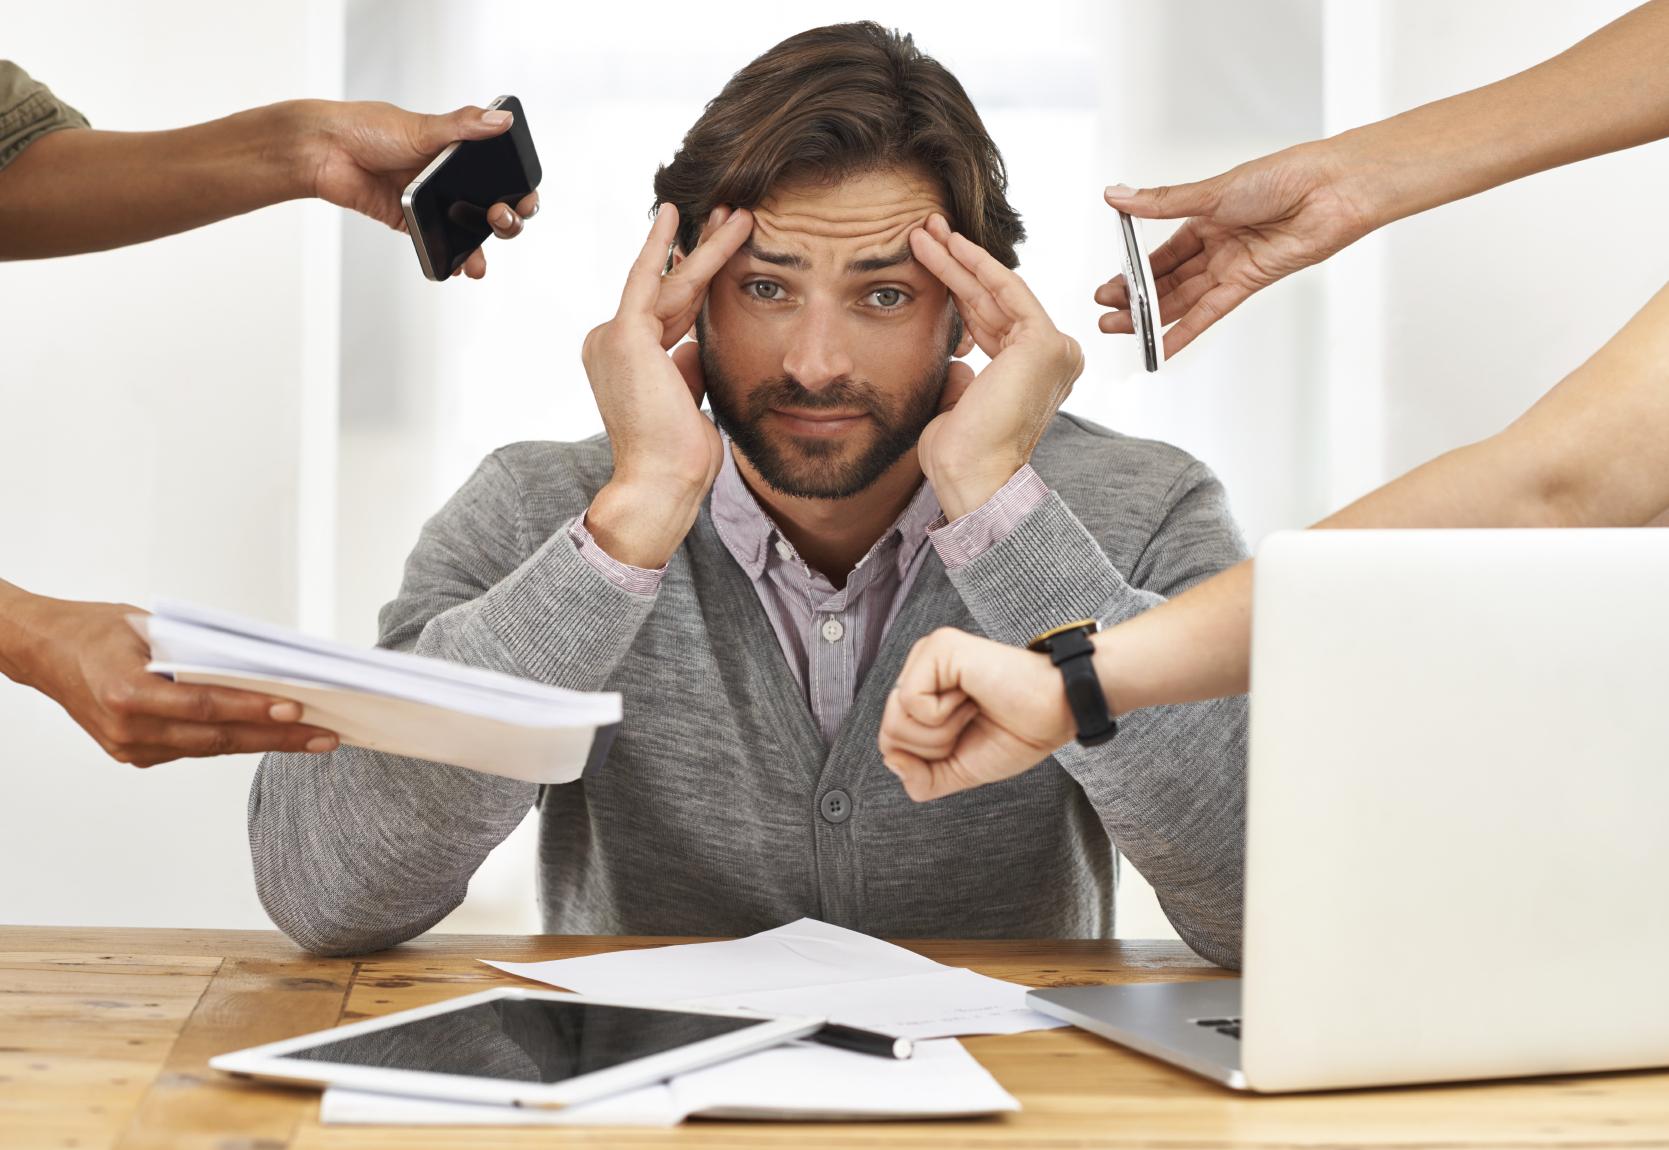 Šta je stres?